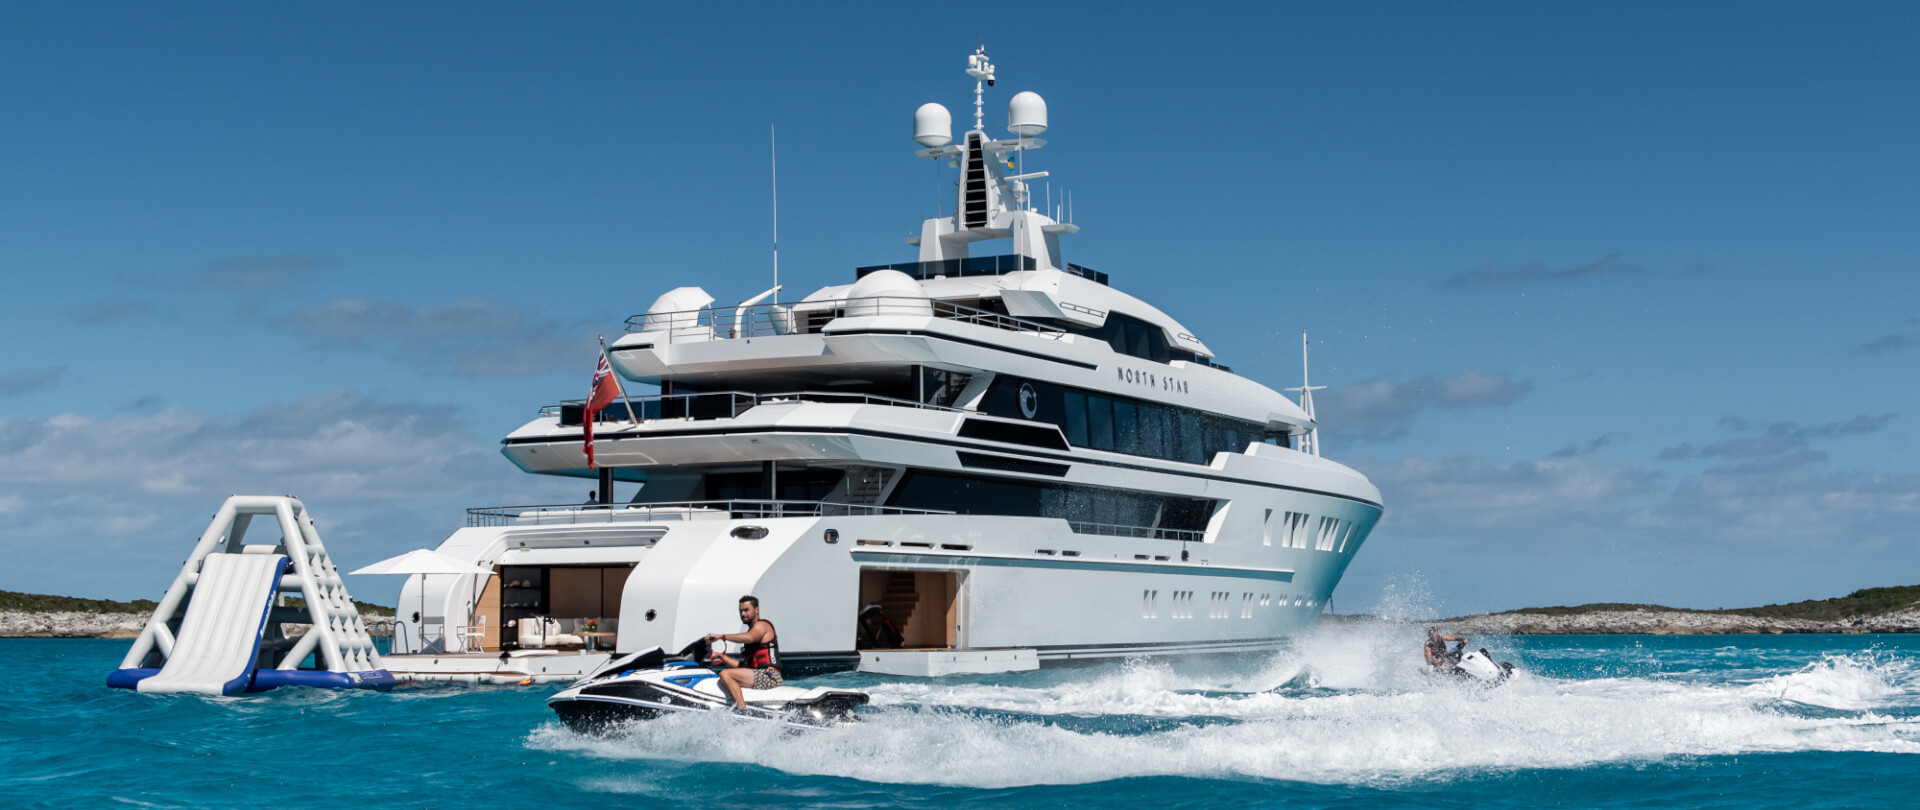 Last chance to book an end of season Mediterranean charter photo 1